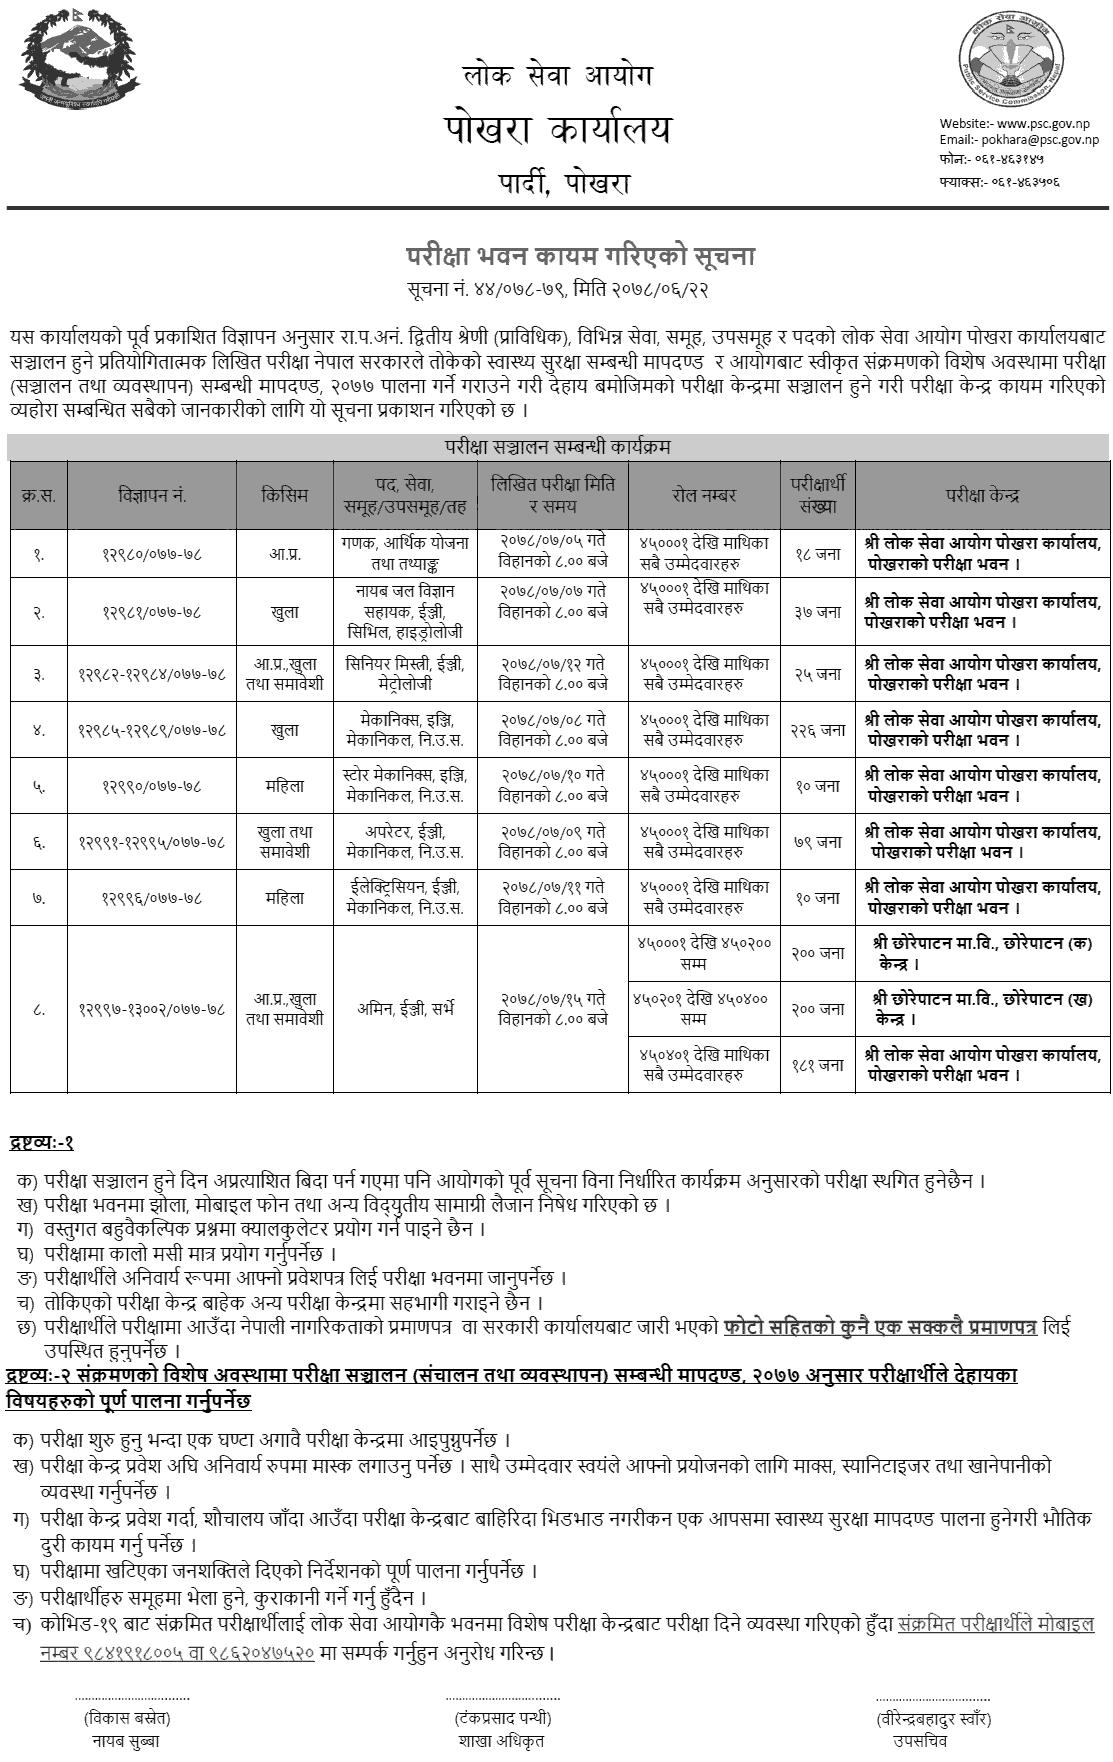 Lok Sewa Aayog Pokhara Written Exam Center of Prabidhik Kharidar